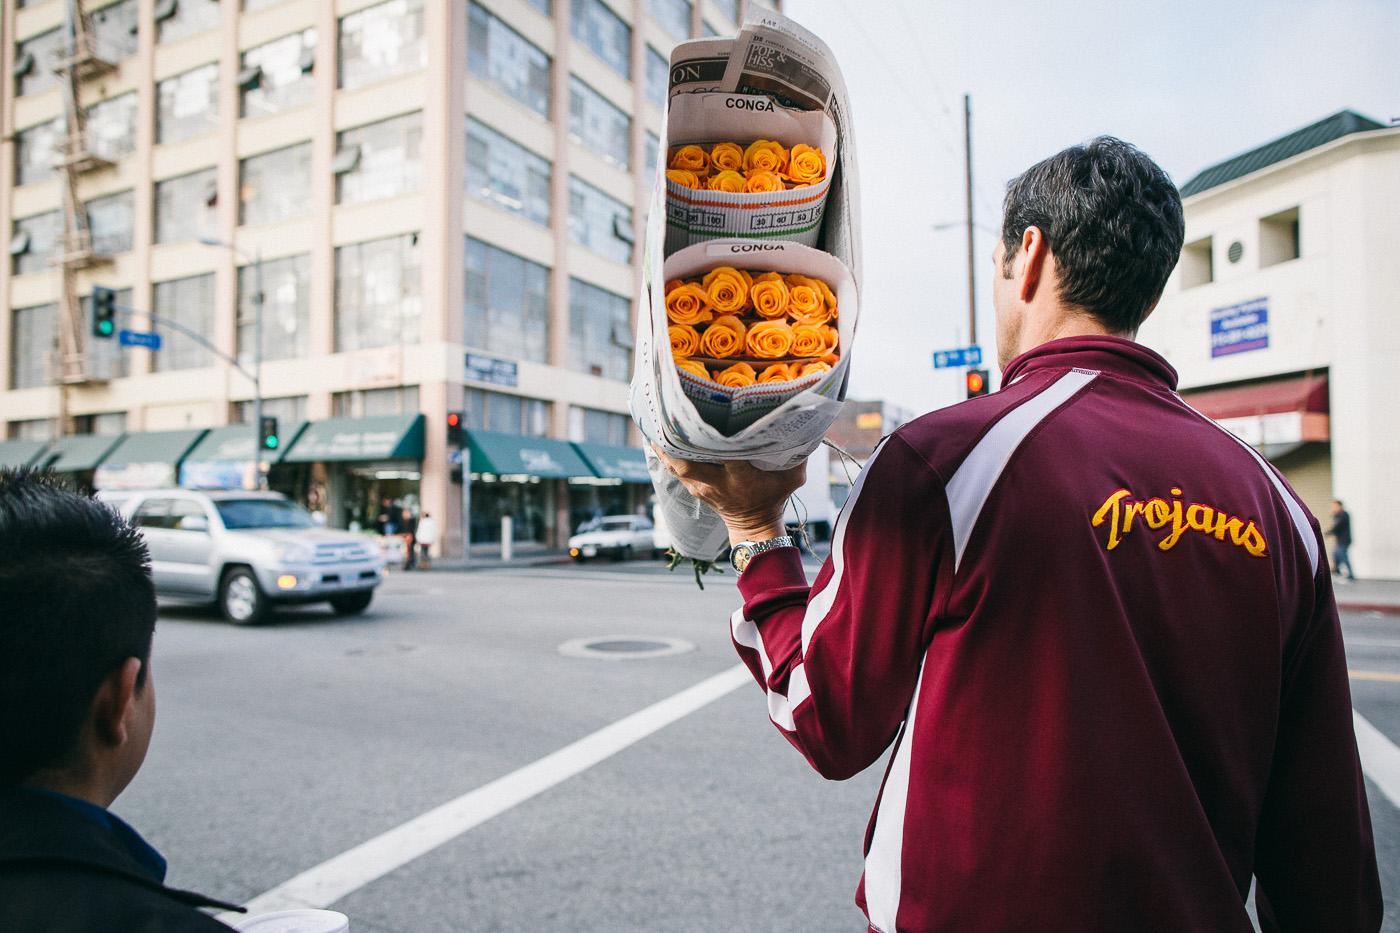 street_flowermarket-2